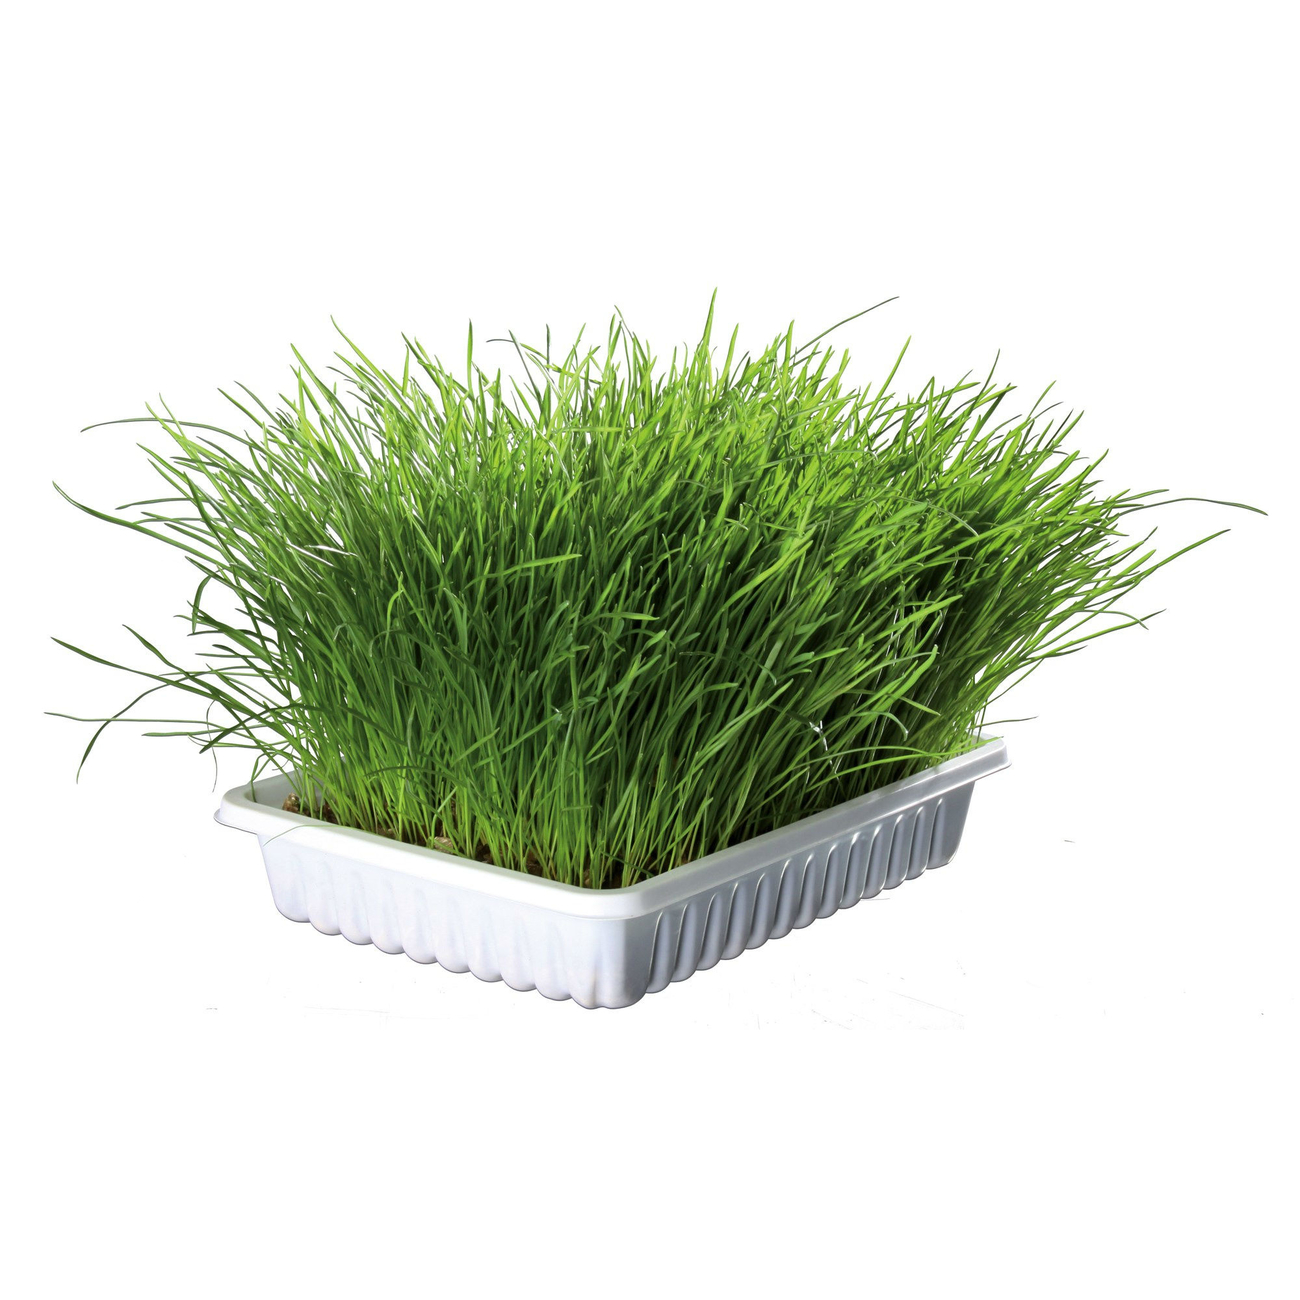 Trixie Katzengras Soft gras selber ziehen 4233